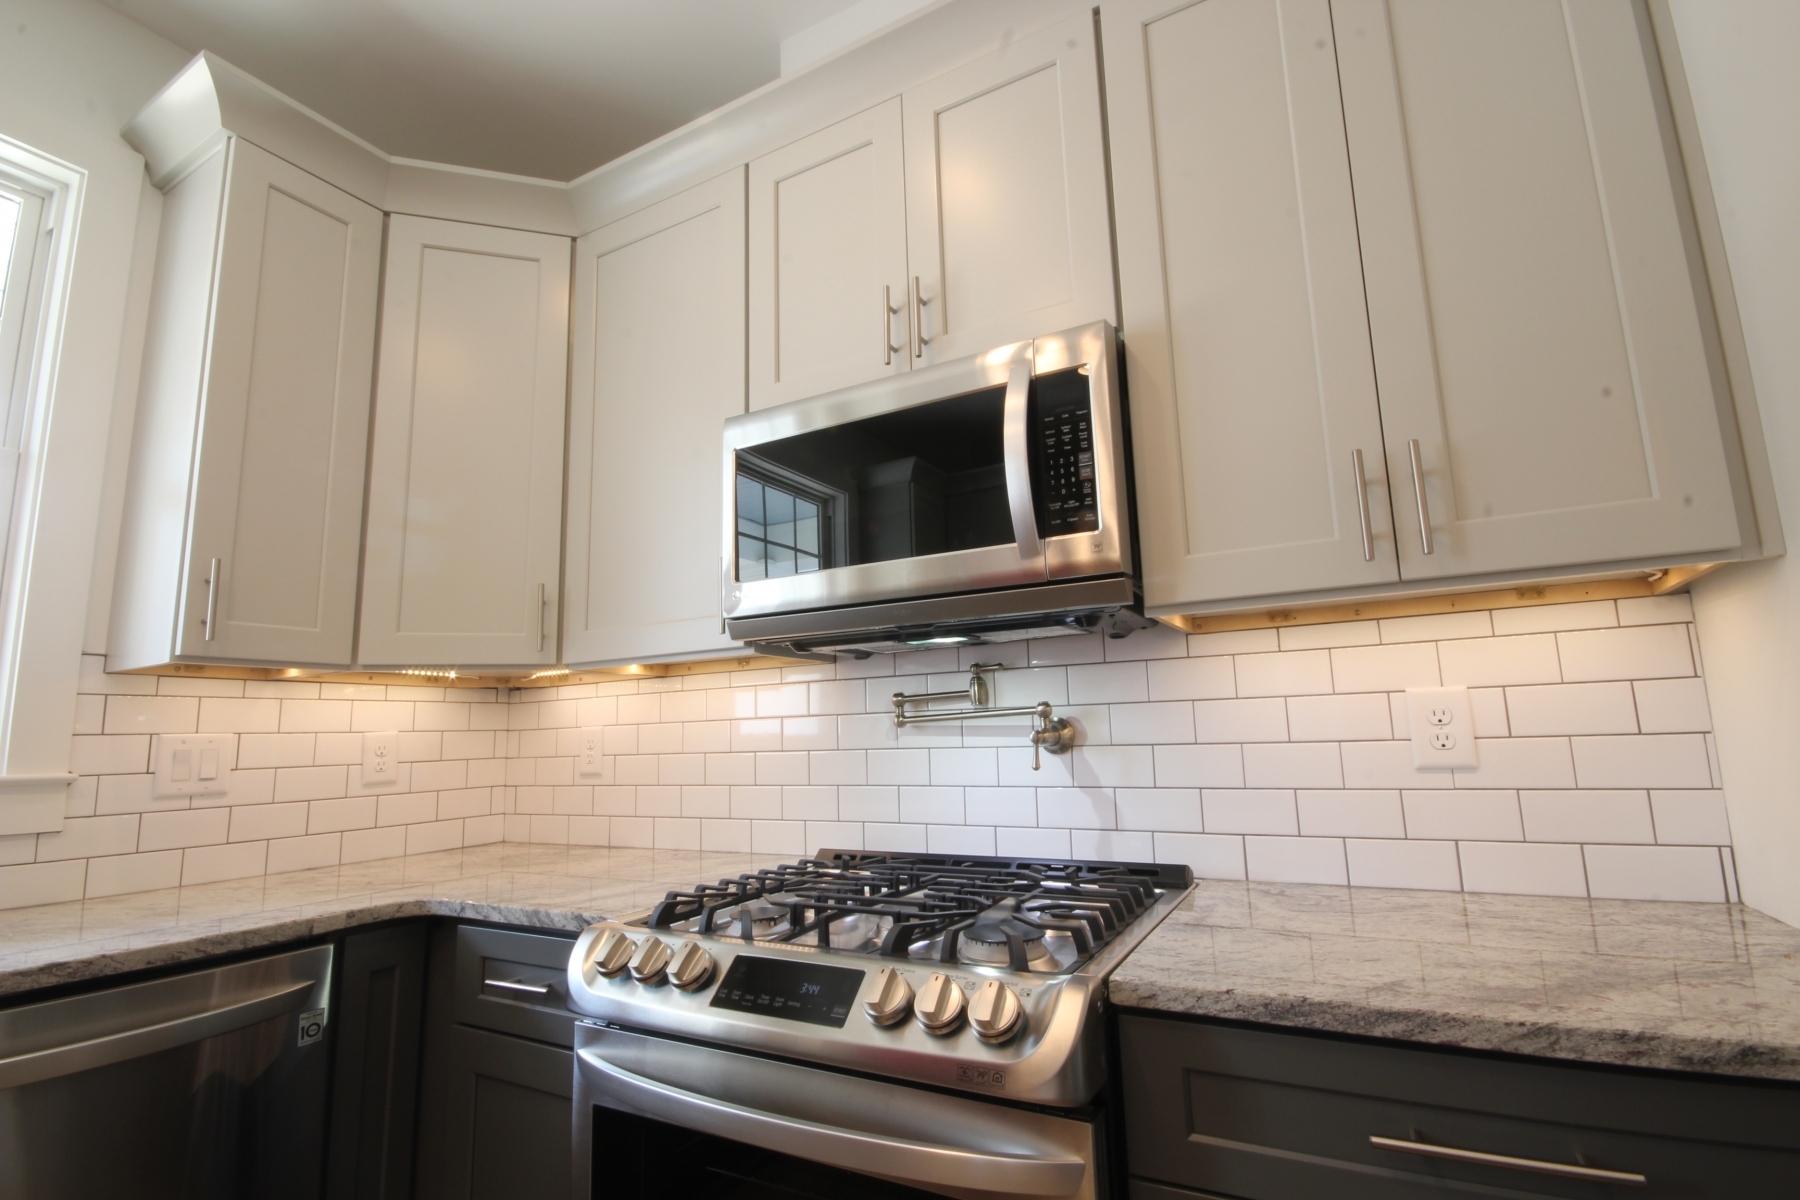 761-ss-kitchen-remodel-2